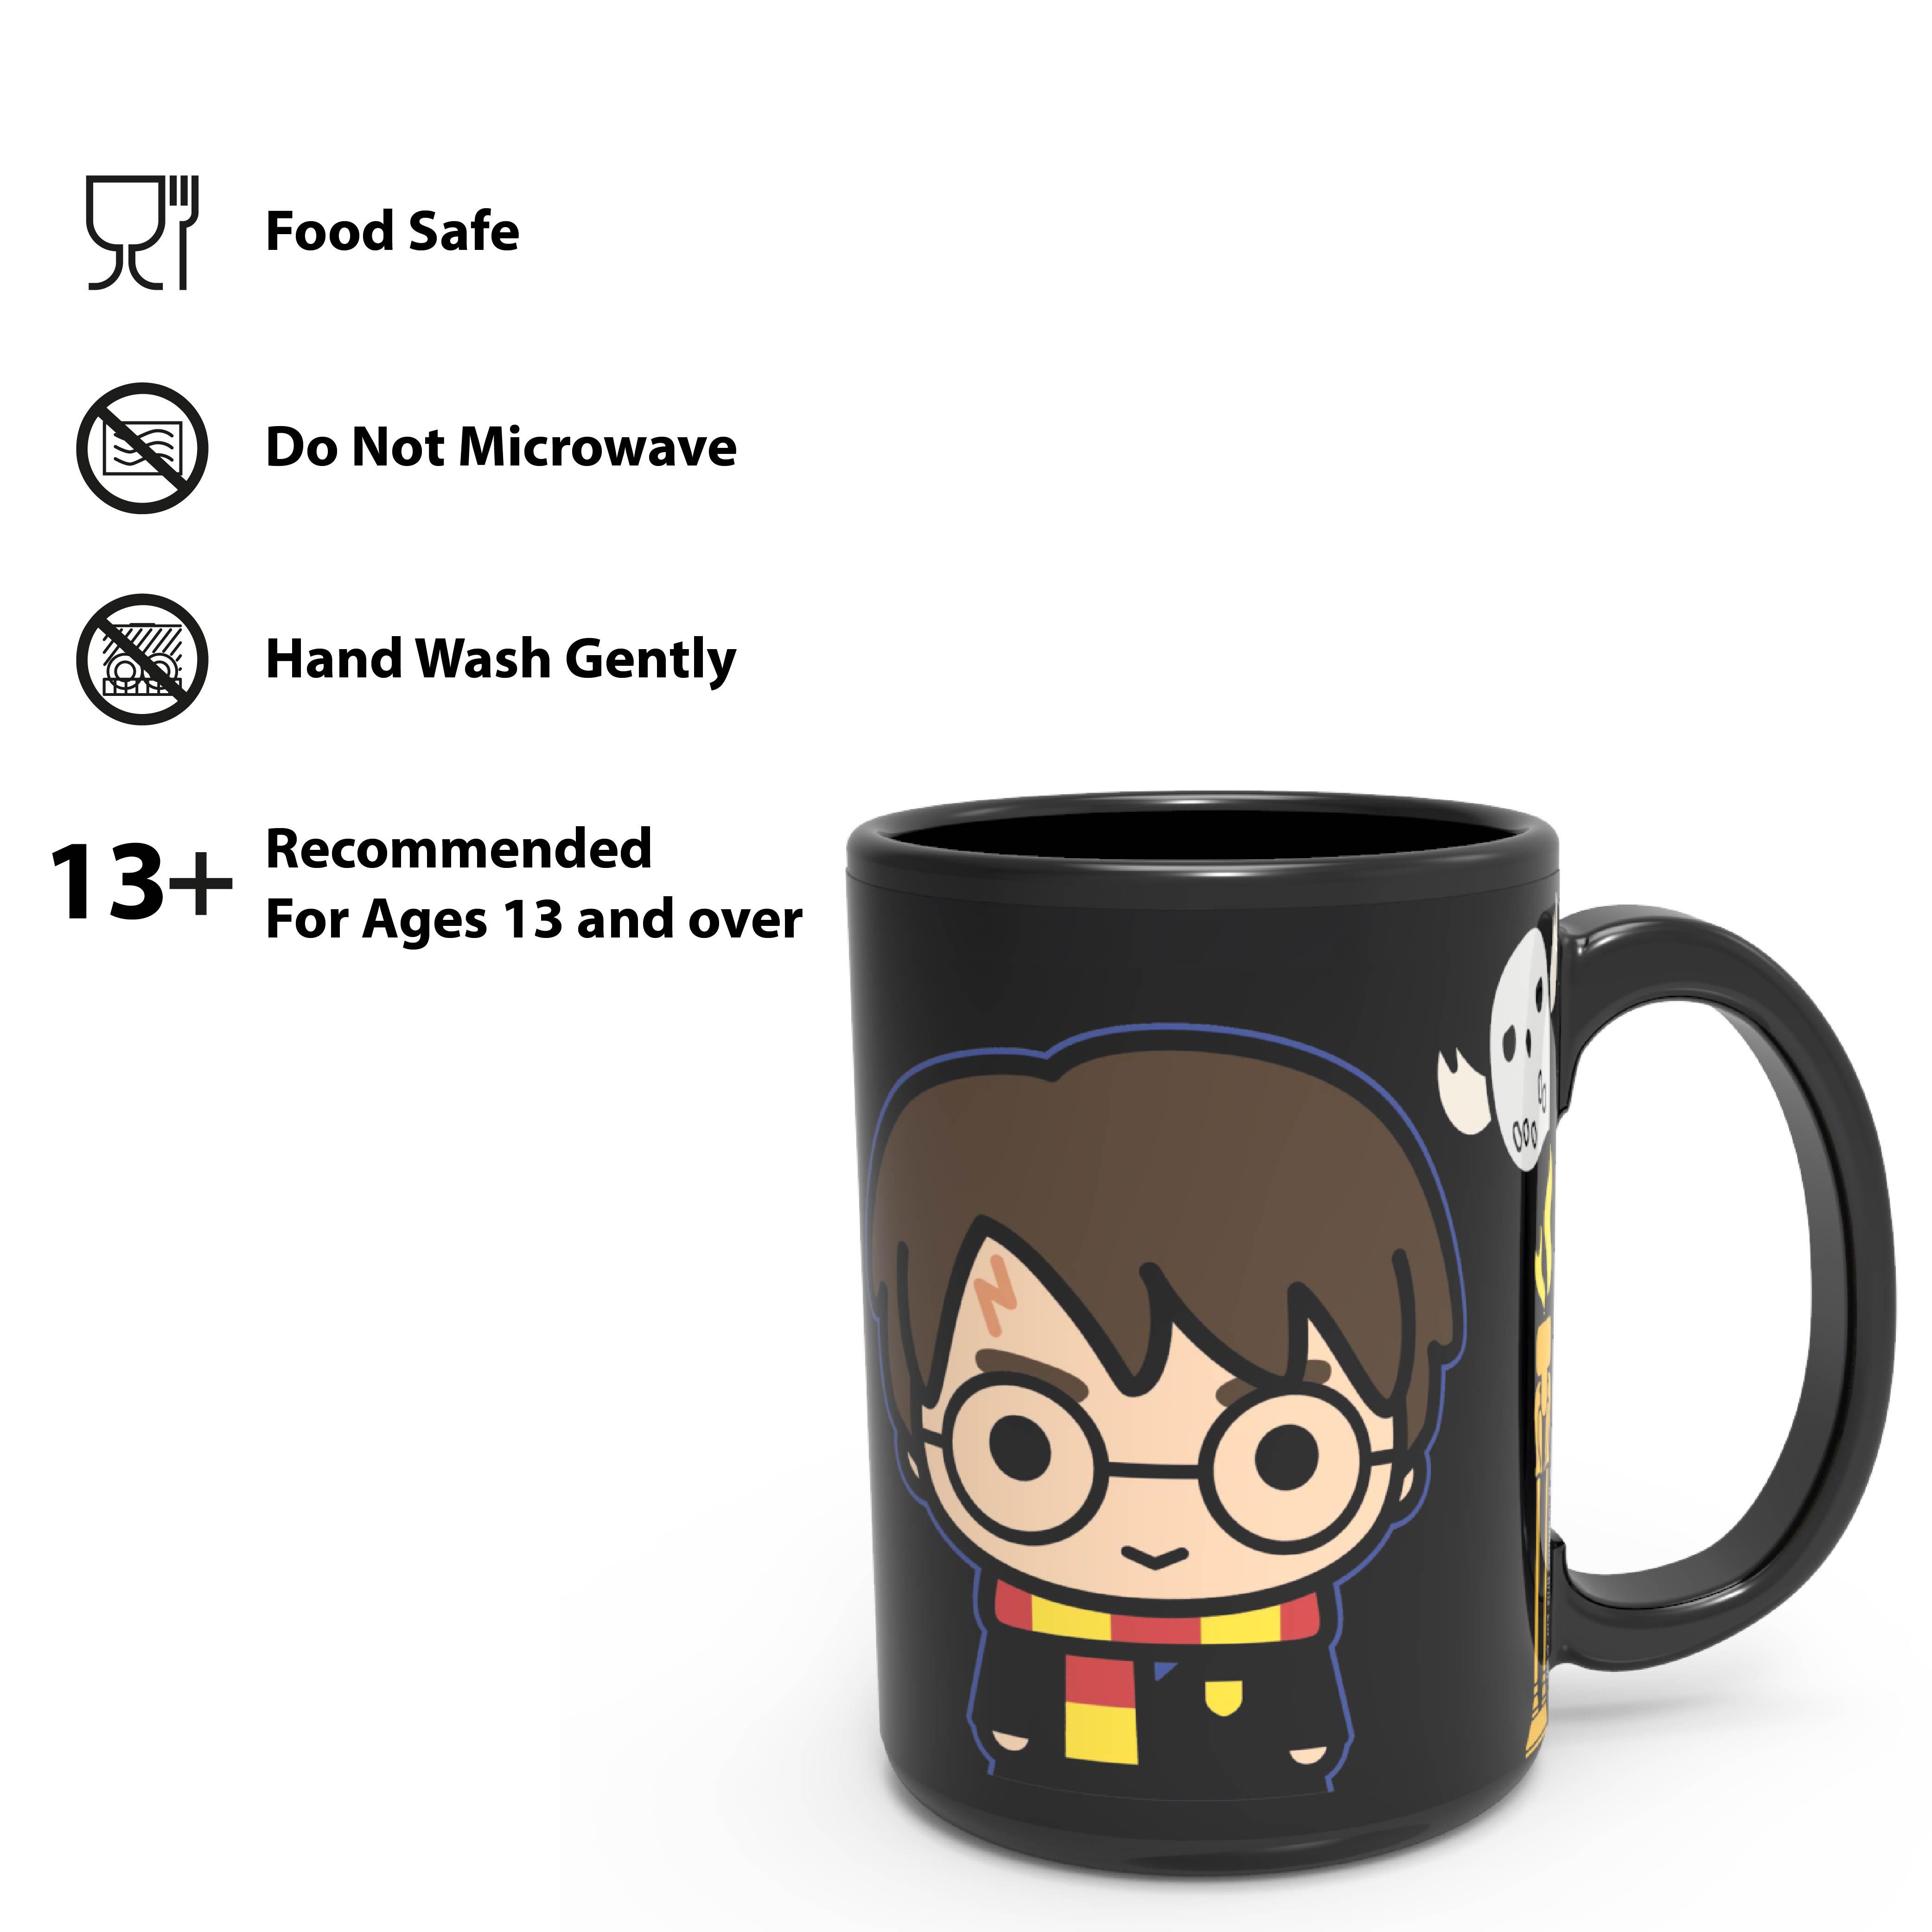 Harry Potter 15 oz. Coffee Mug, The Sorcerer's Stone slideshow image 10